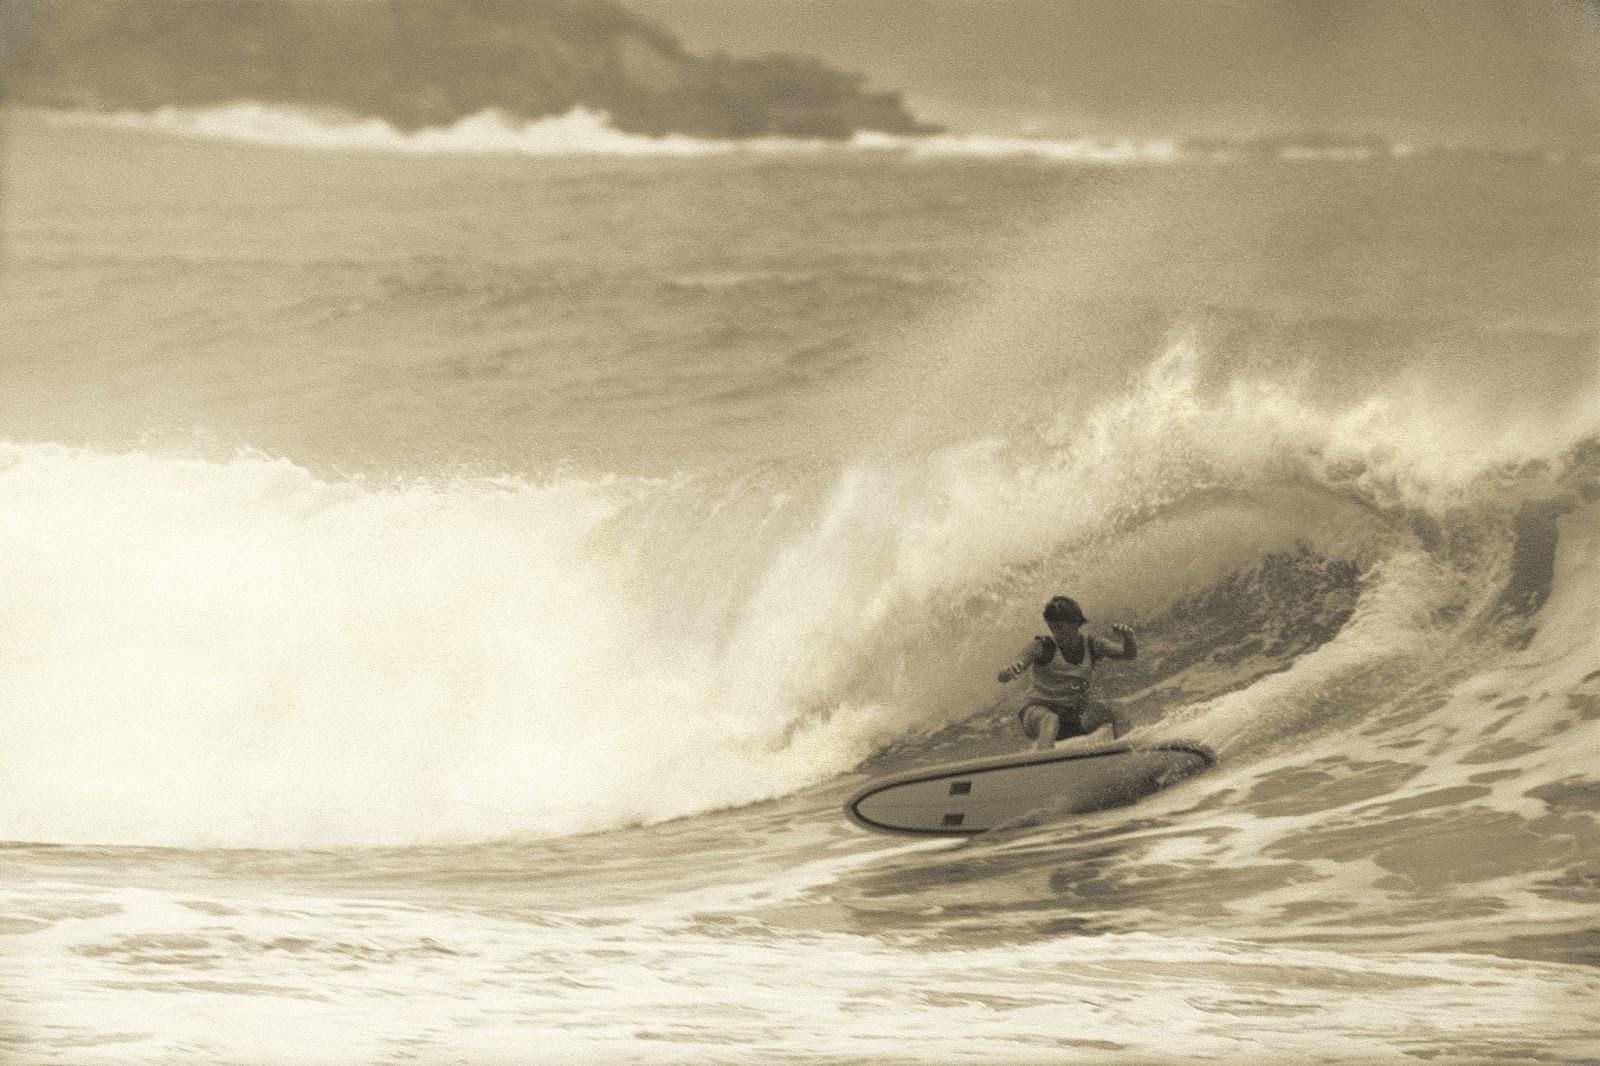 wayne dean surfer - HD4651×3100